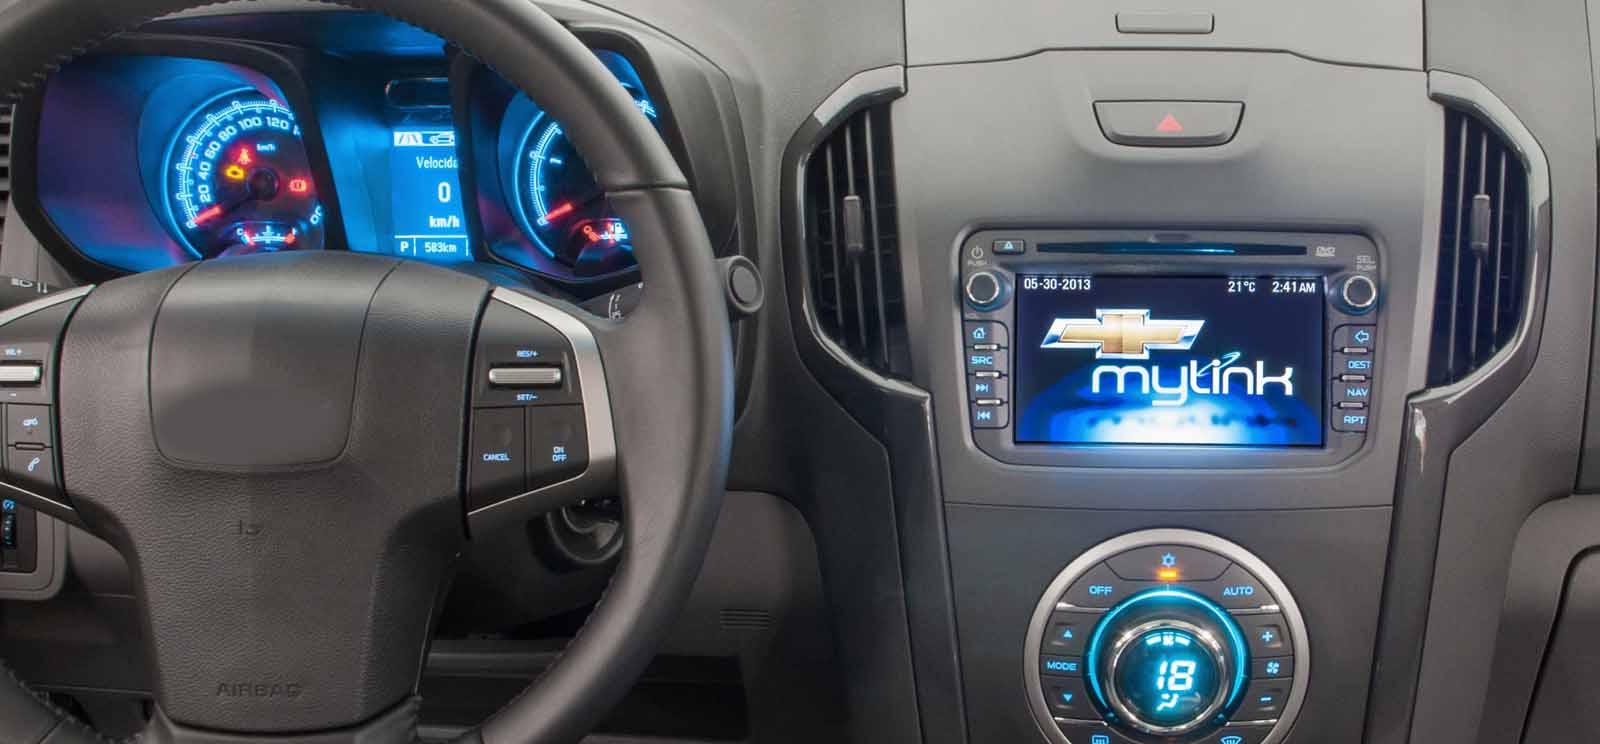 Chevrolet Trailblazer Chevy Colorado S-10 S10 GMC Canyon Holden Colorado Isuzu D-Max MU-X V-Cross 2012-2019 factory radio